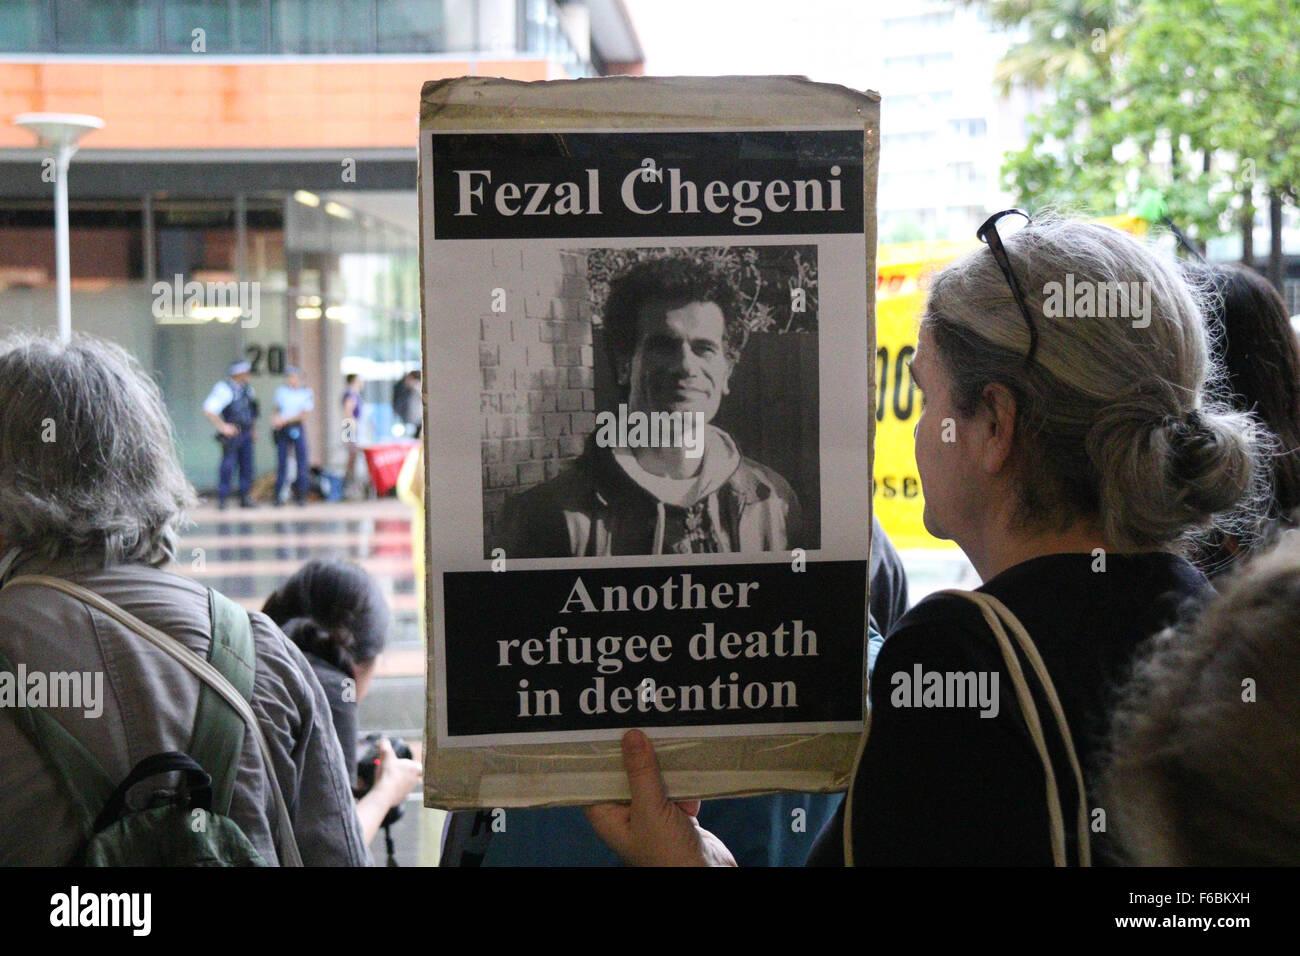 Rally for Iranian Kurdish refugee, Fazel Chegen in Sydney, Australia. 13 November 2015. - Stock Image